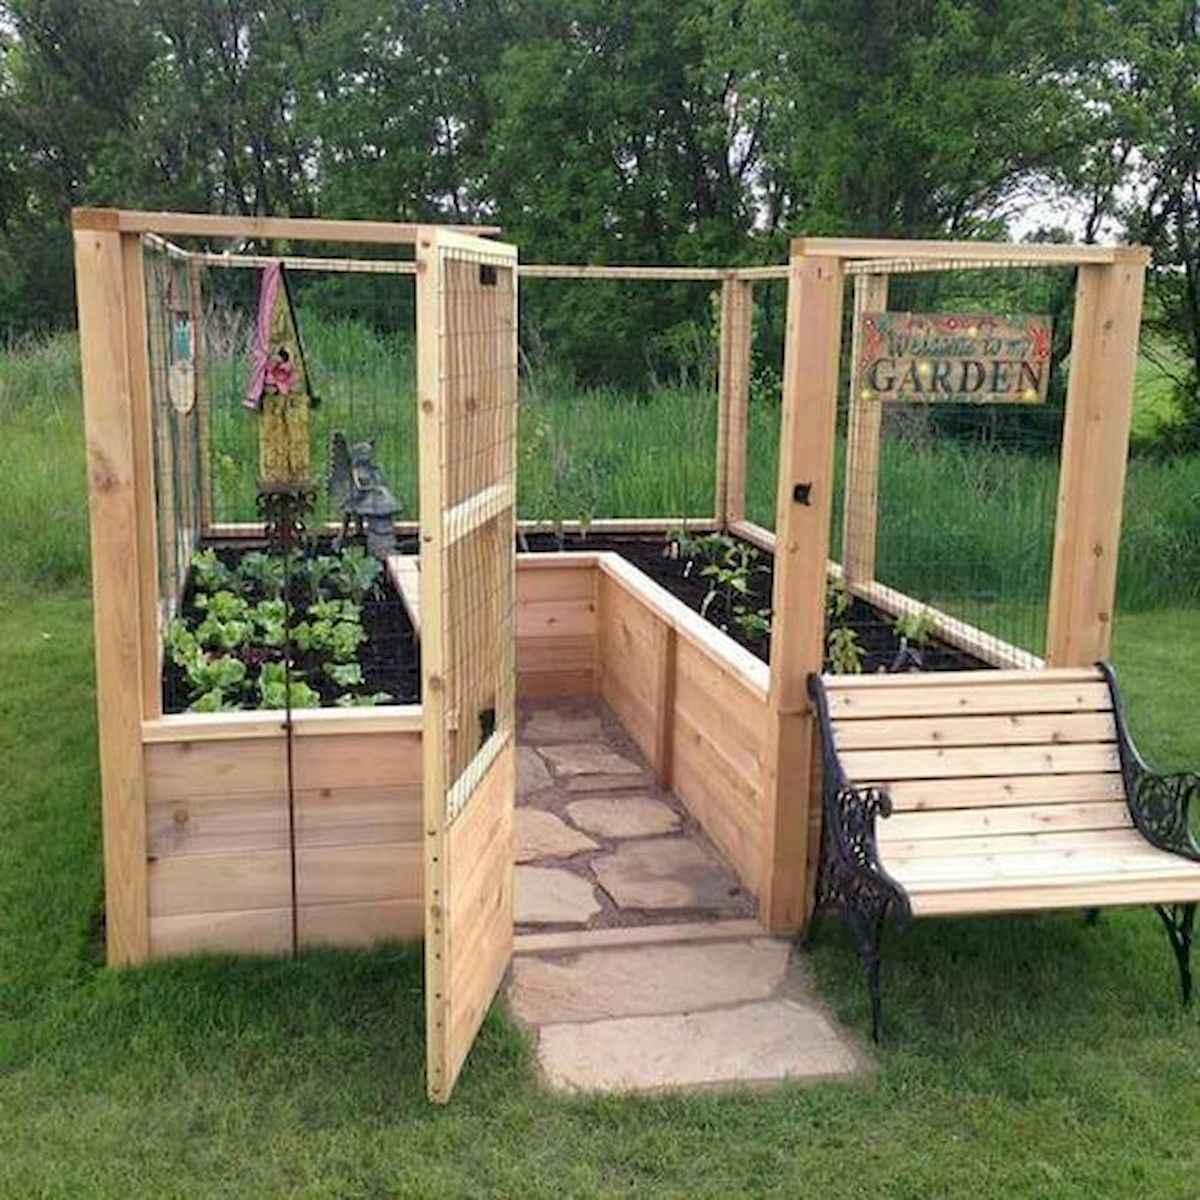 55 Favorite Garden Boxes Raised Design Ideas (2)